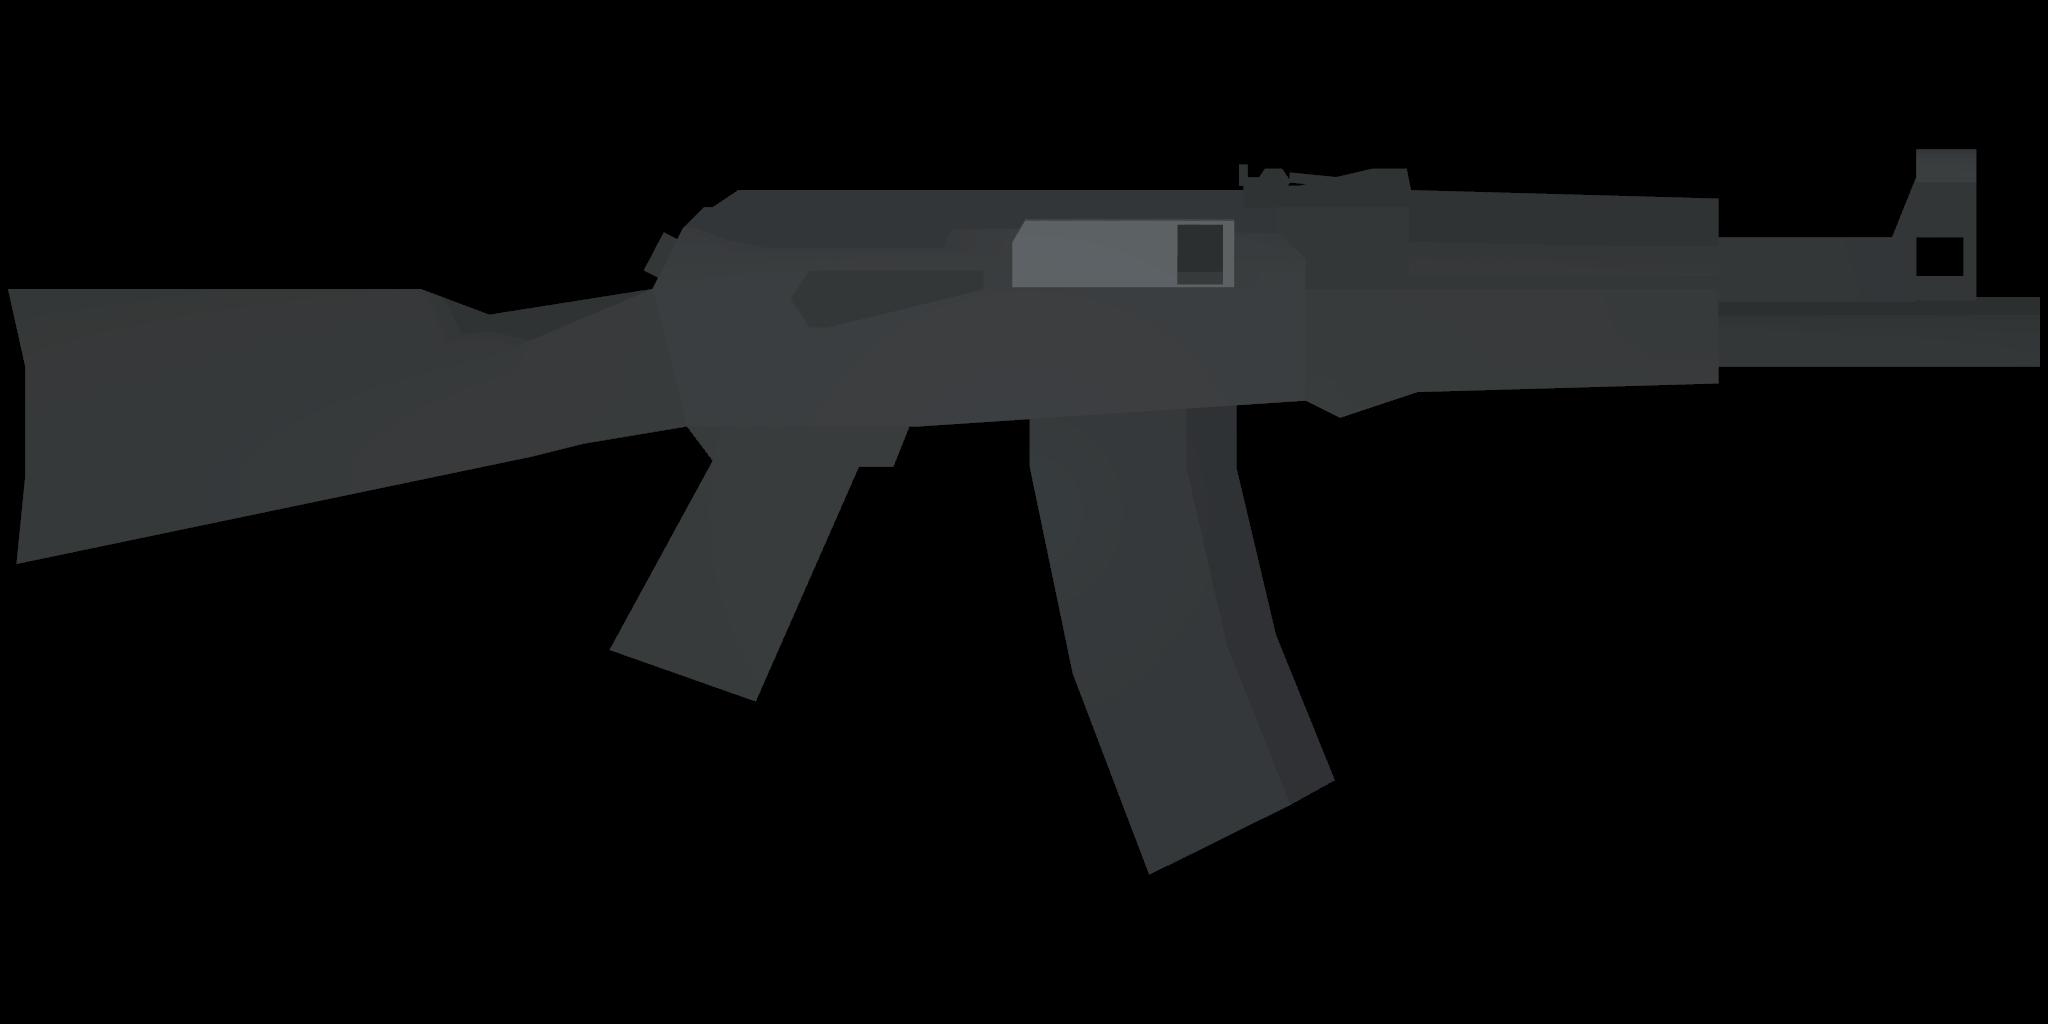 Unturned Uncreated Warfare Mods & All ID List + Attachments - Russian Weapons - EA28EBC